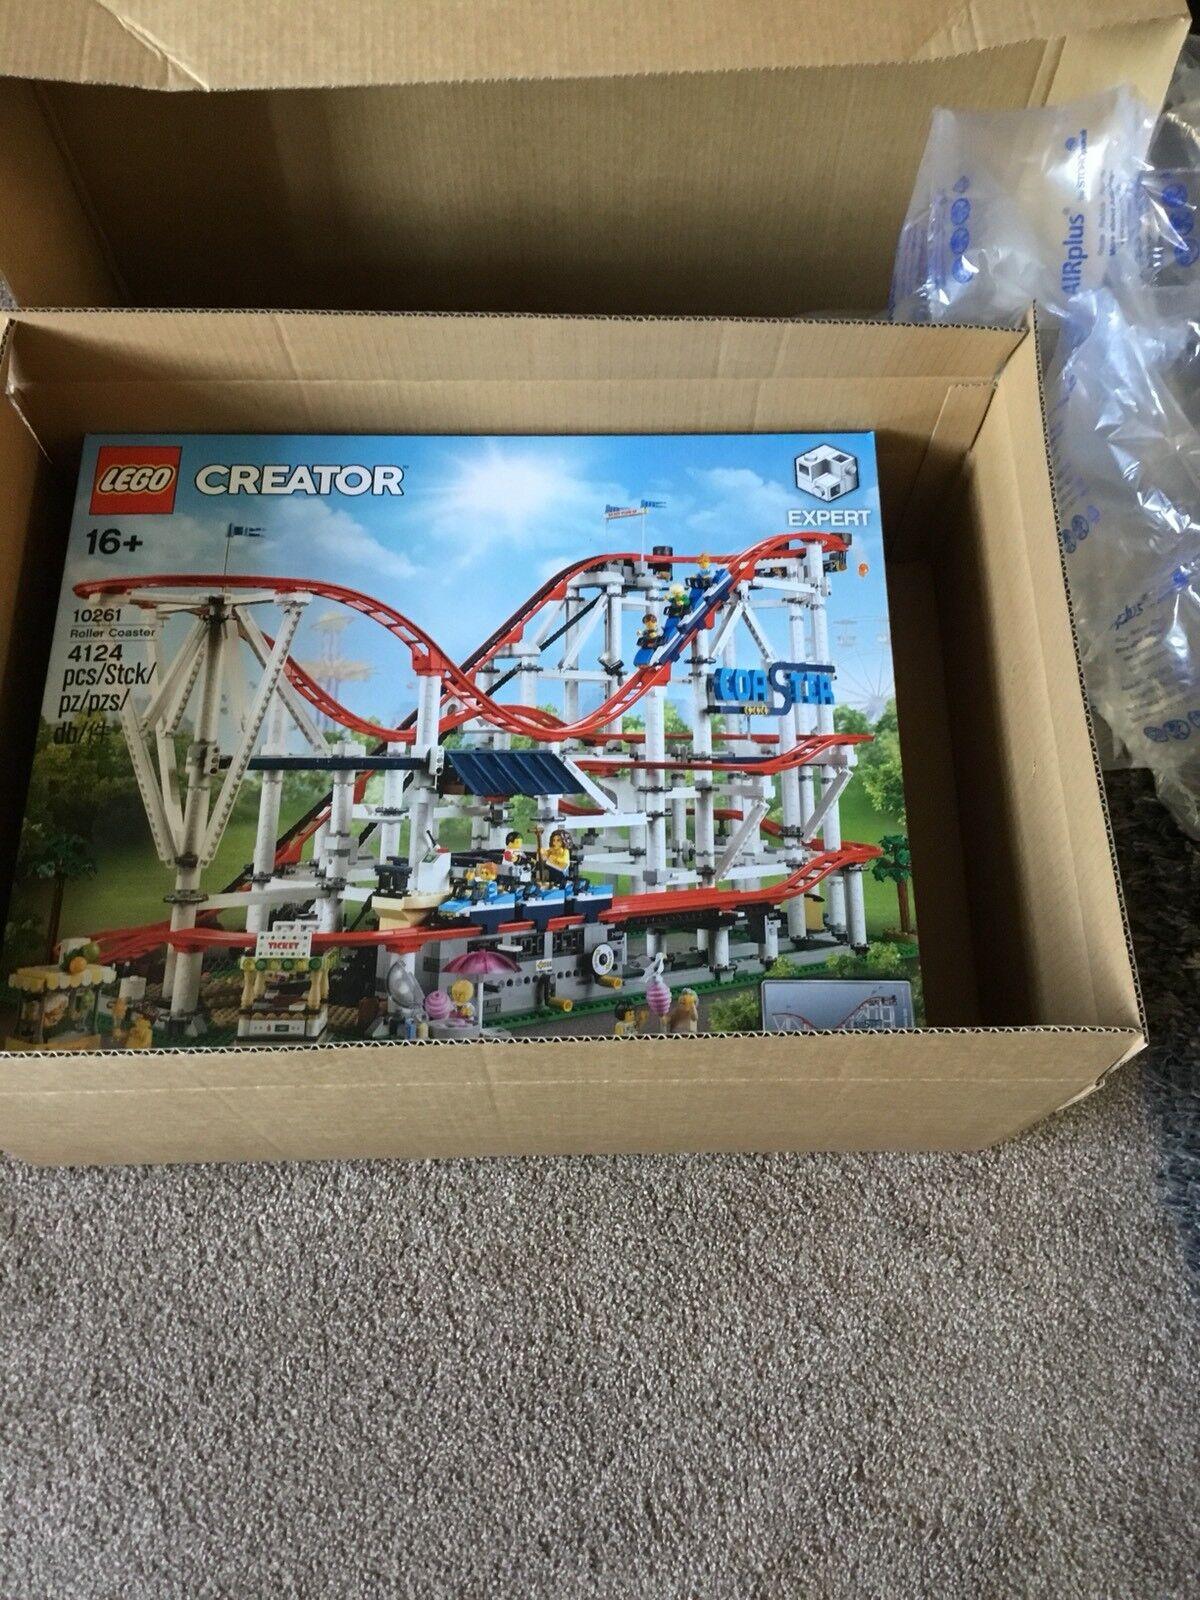 LEGO 10261 CREATOR EXPERT ROLLER COASTER